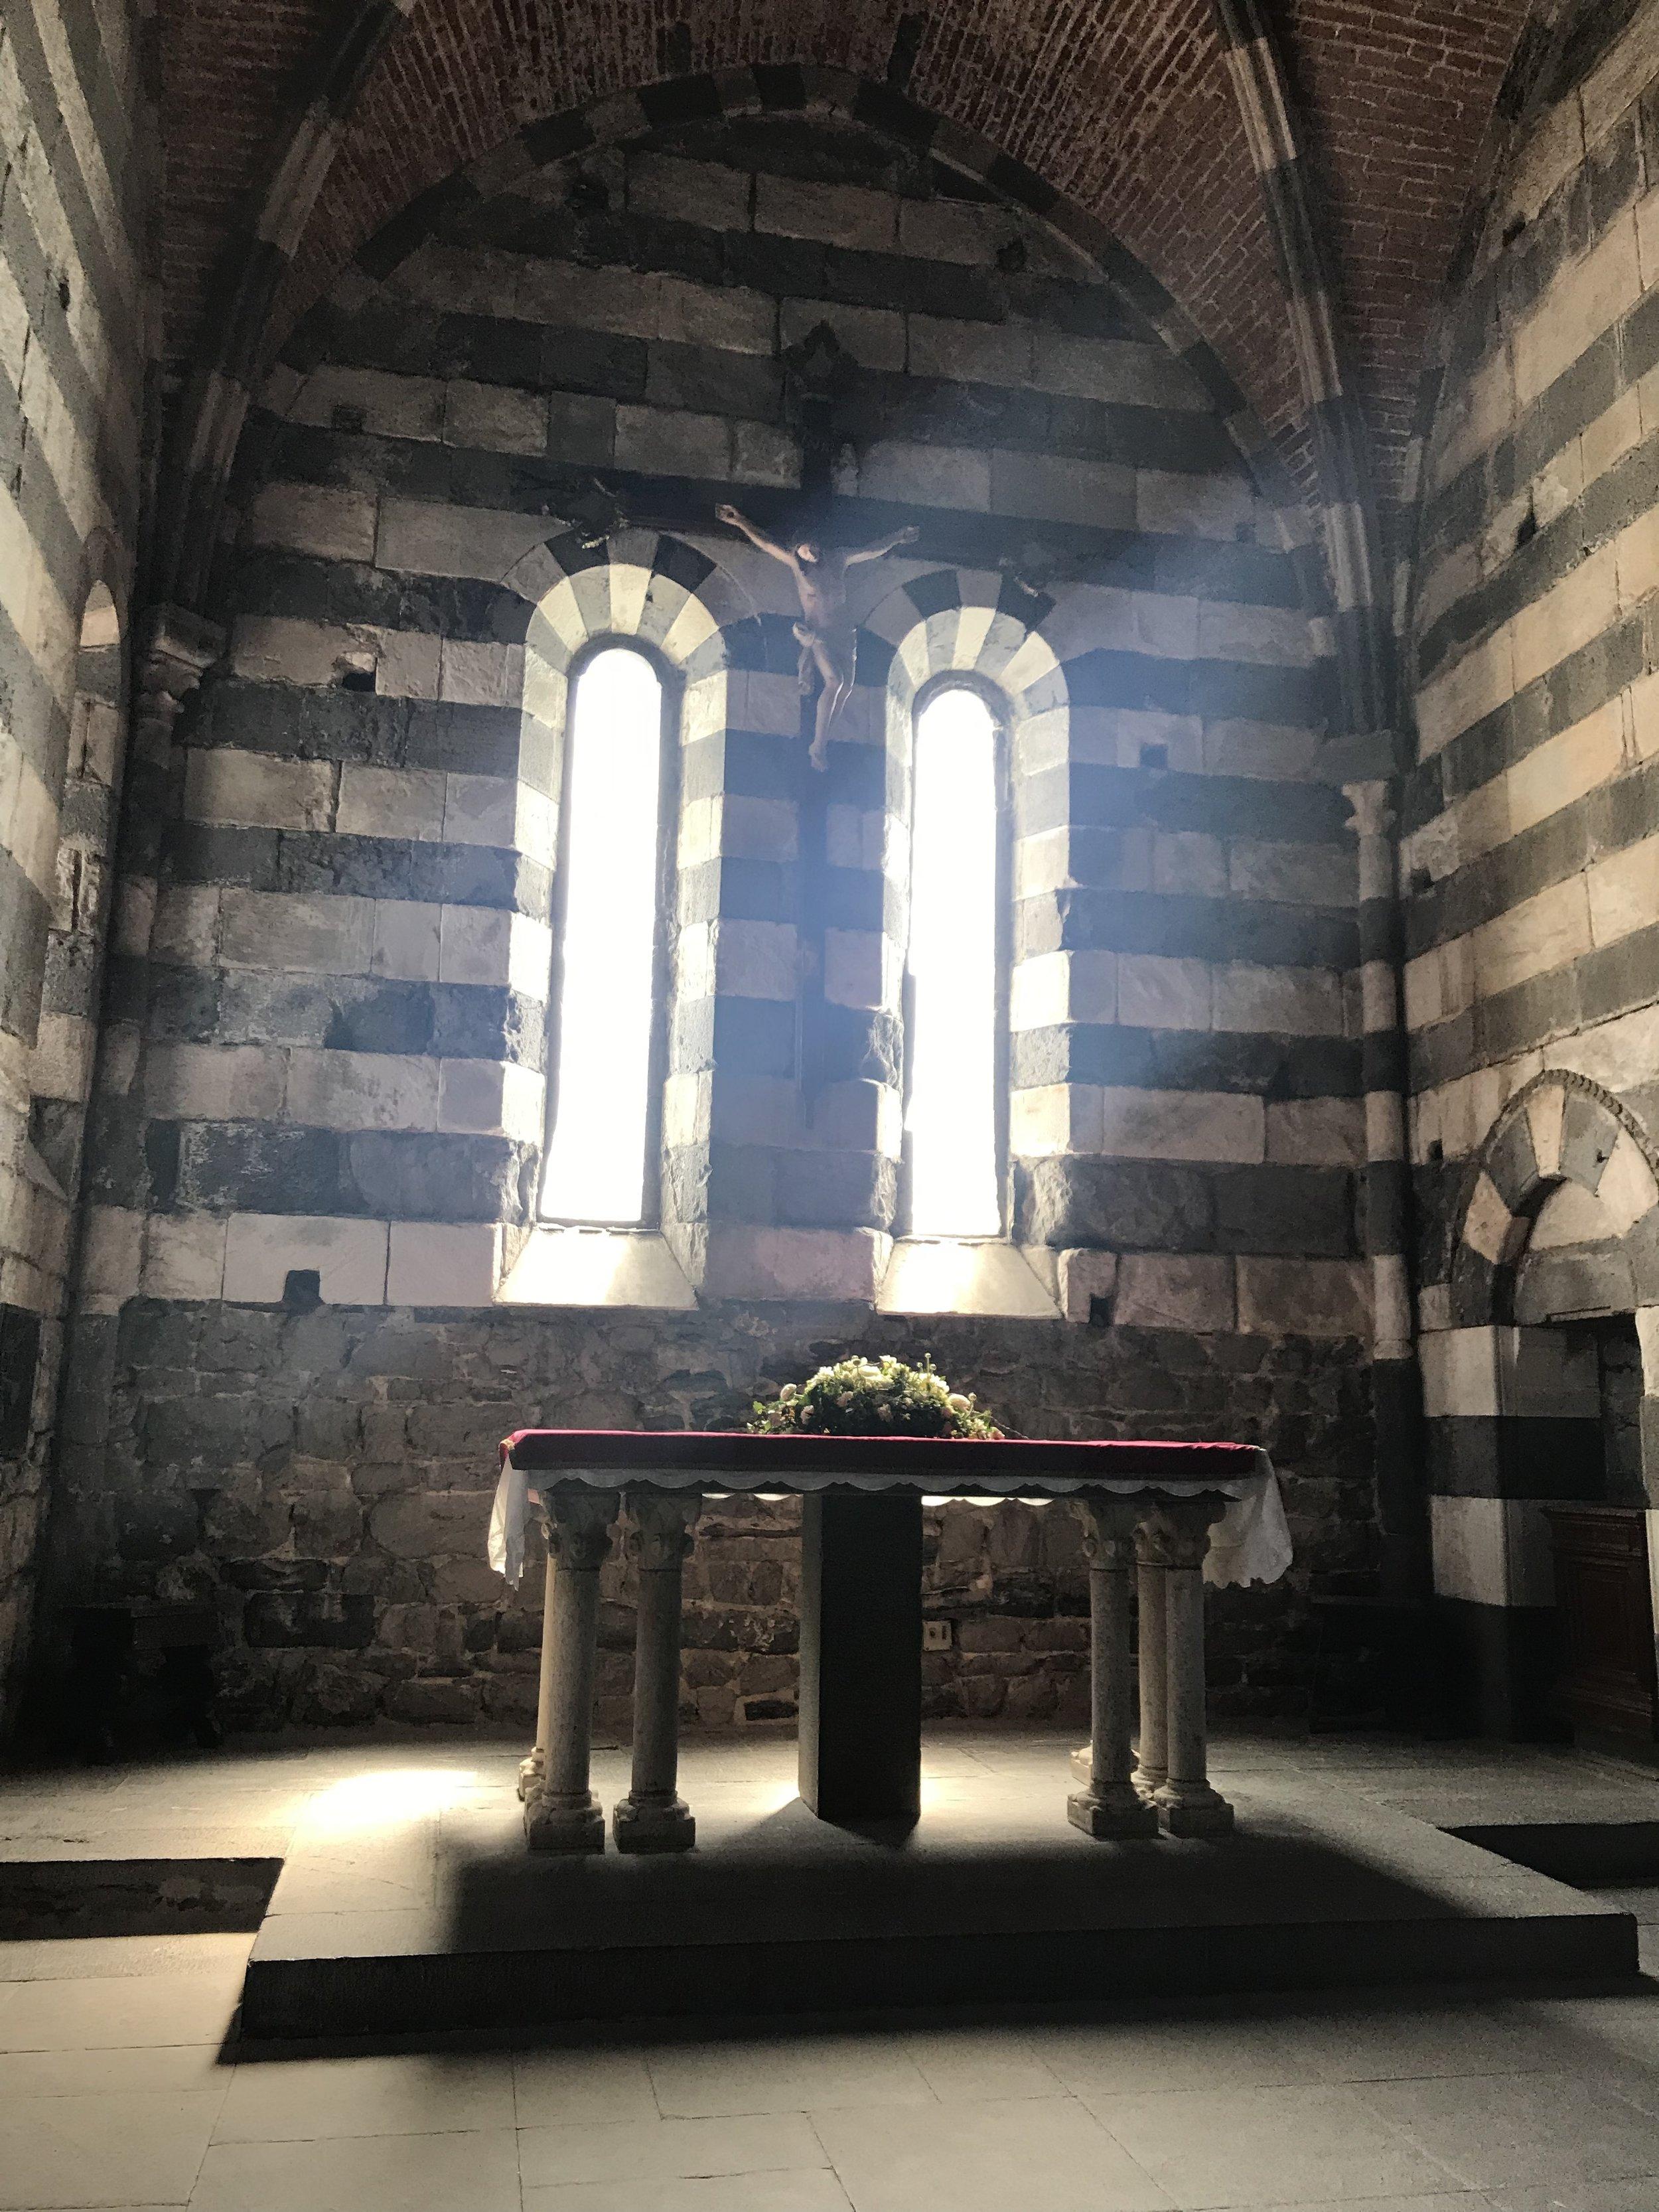 The altar inside the church at Portovenere.